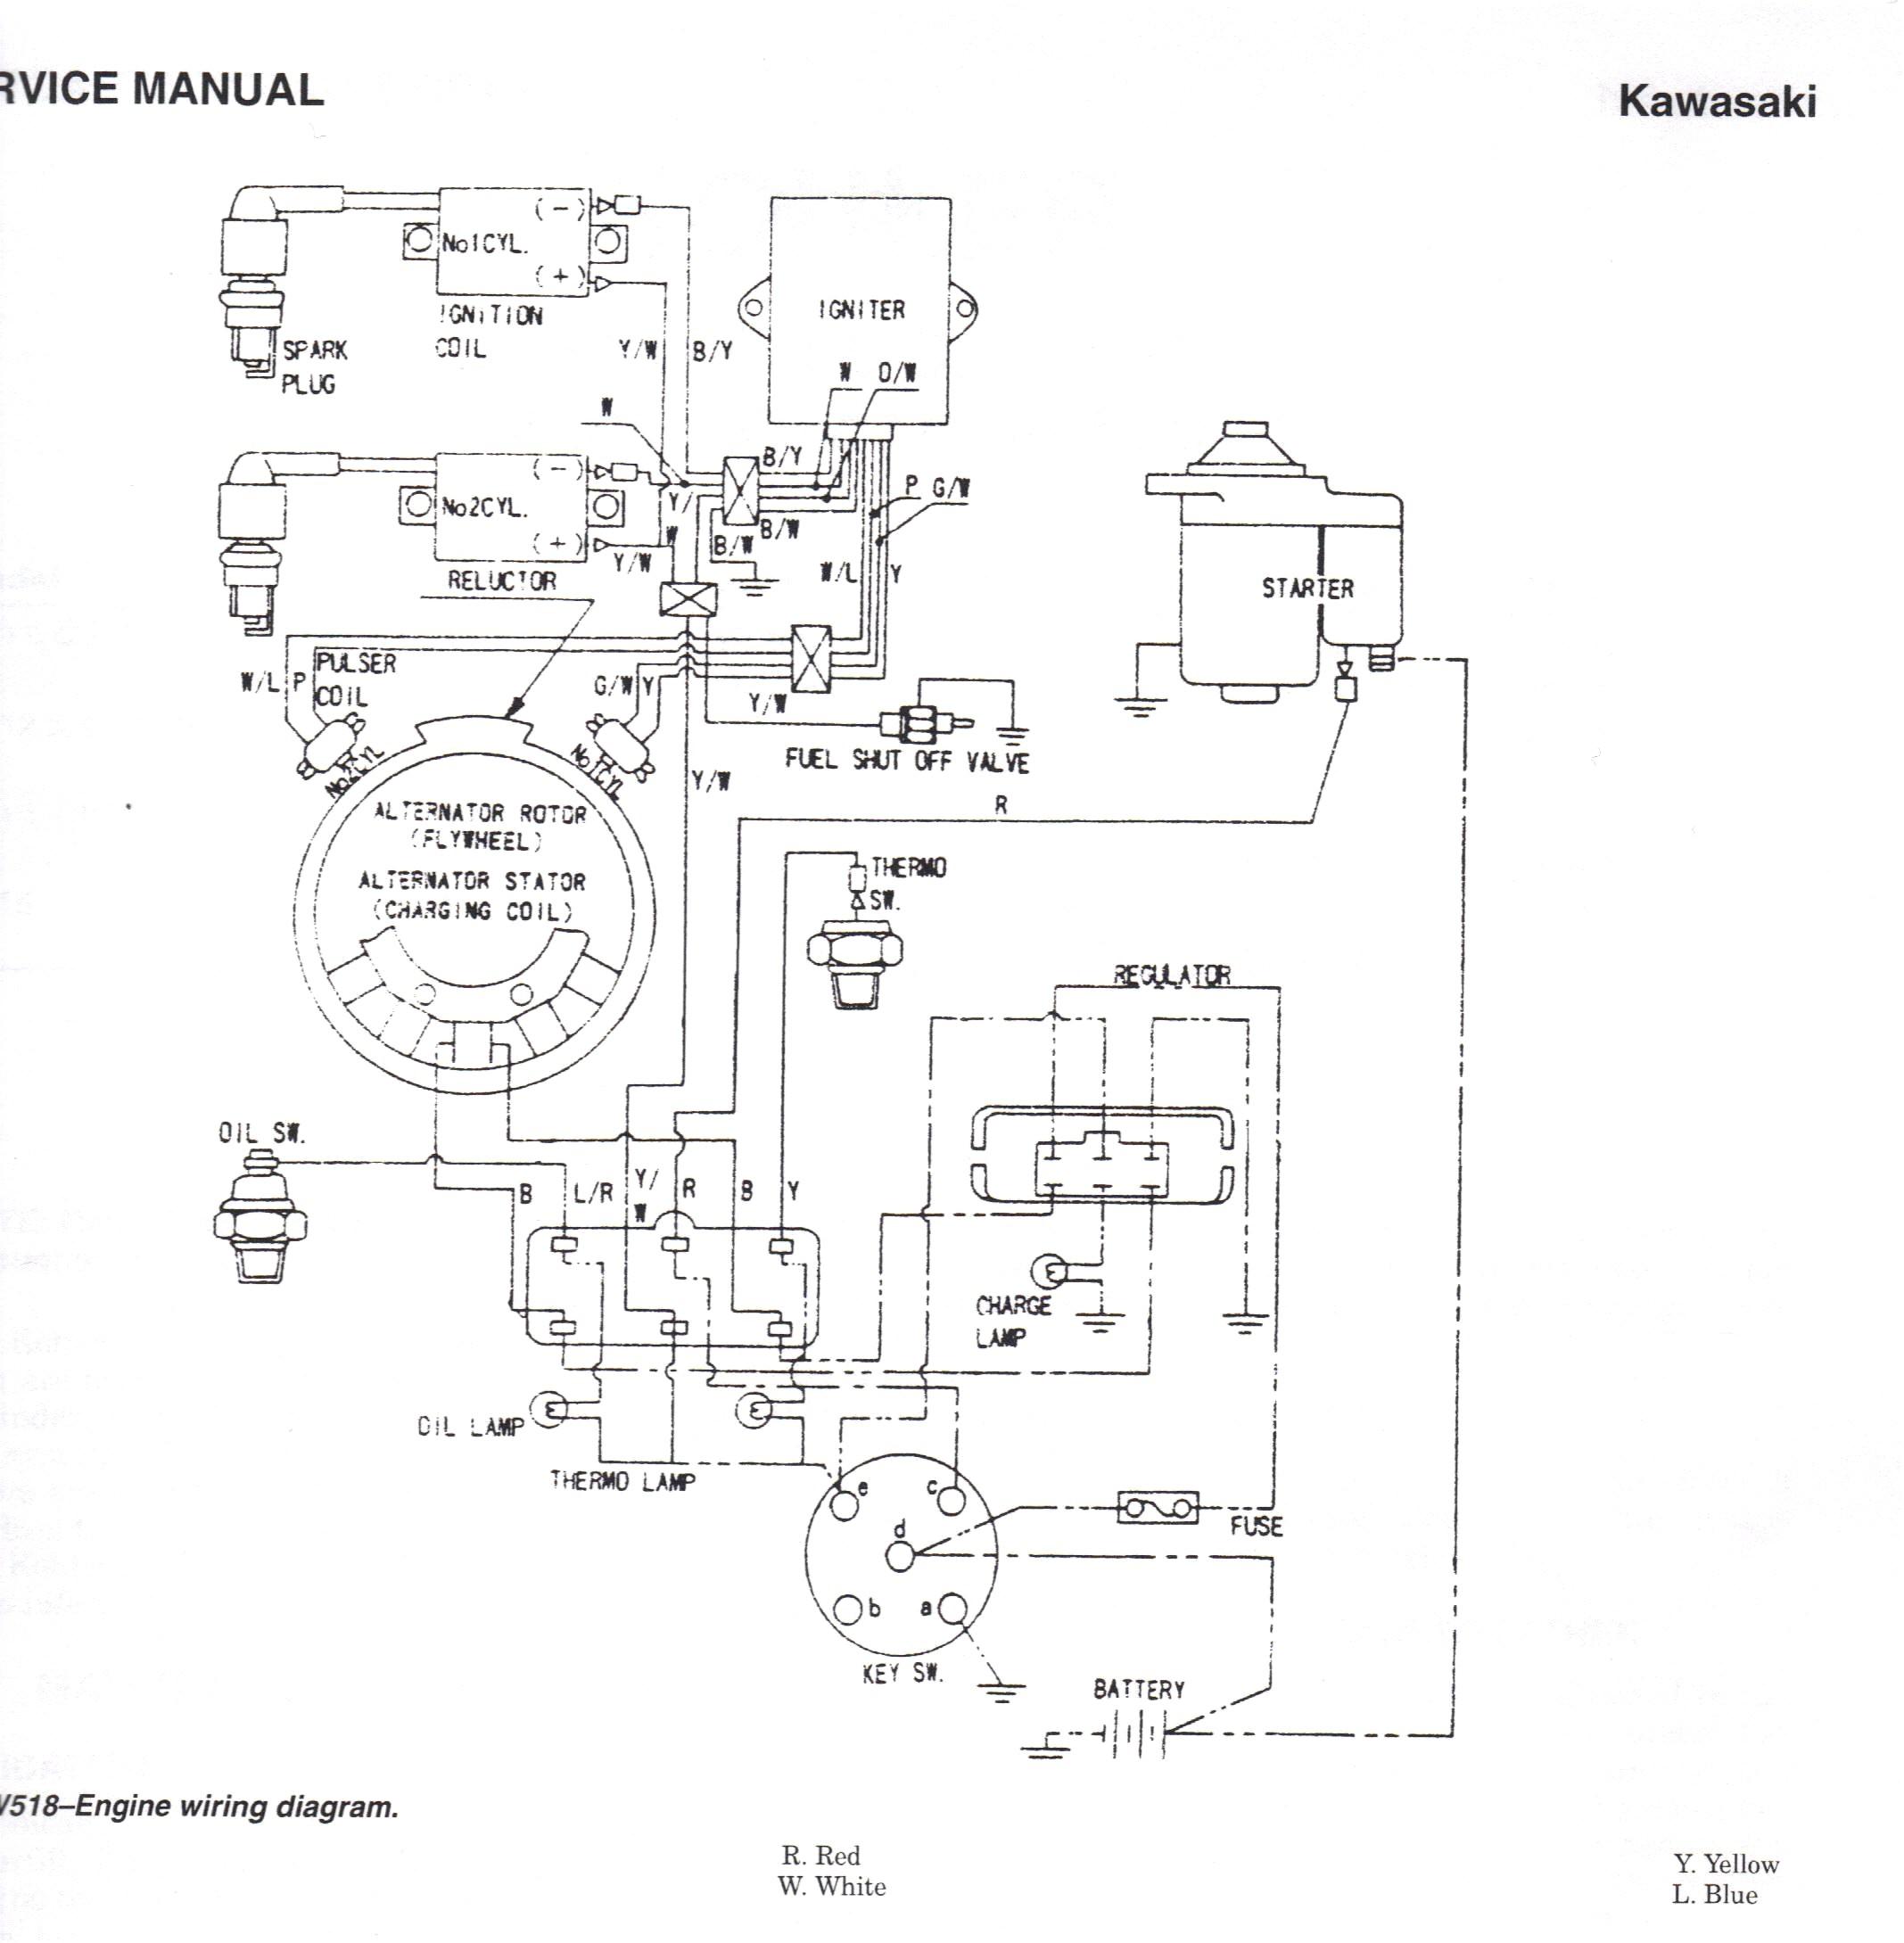 John Deere La105 Engine Diagram John Deere 2320 Wiring Diagram Wiring Diagram Of John Deere La105 Engine Diagram